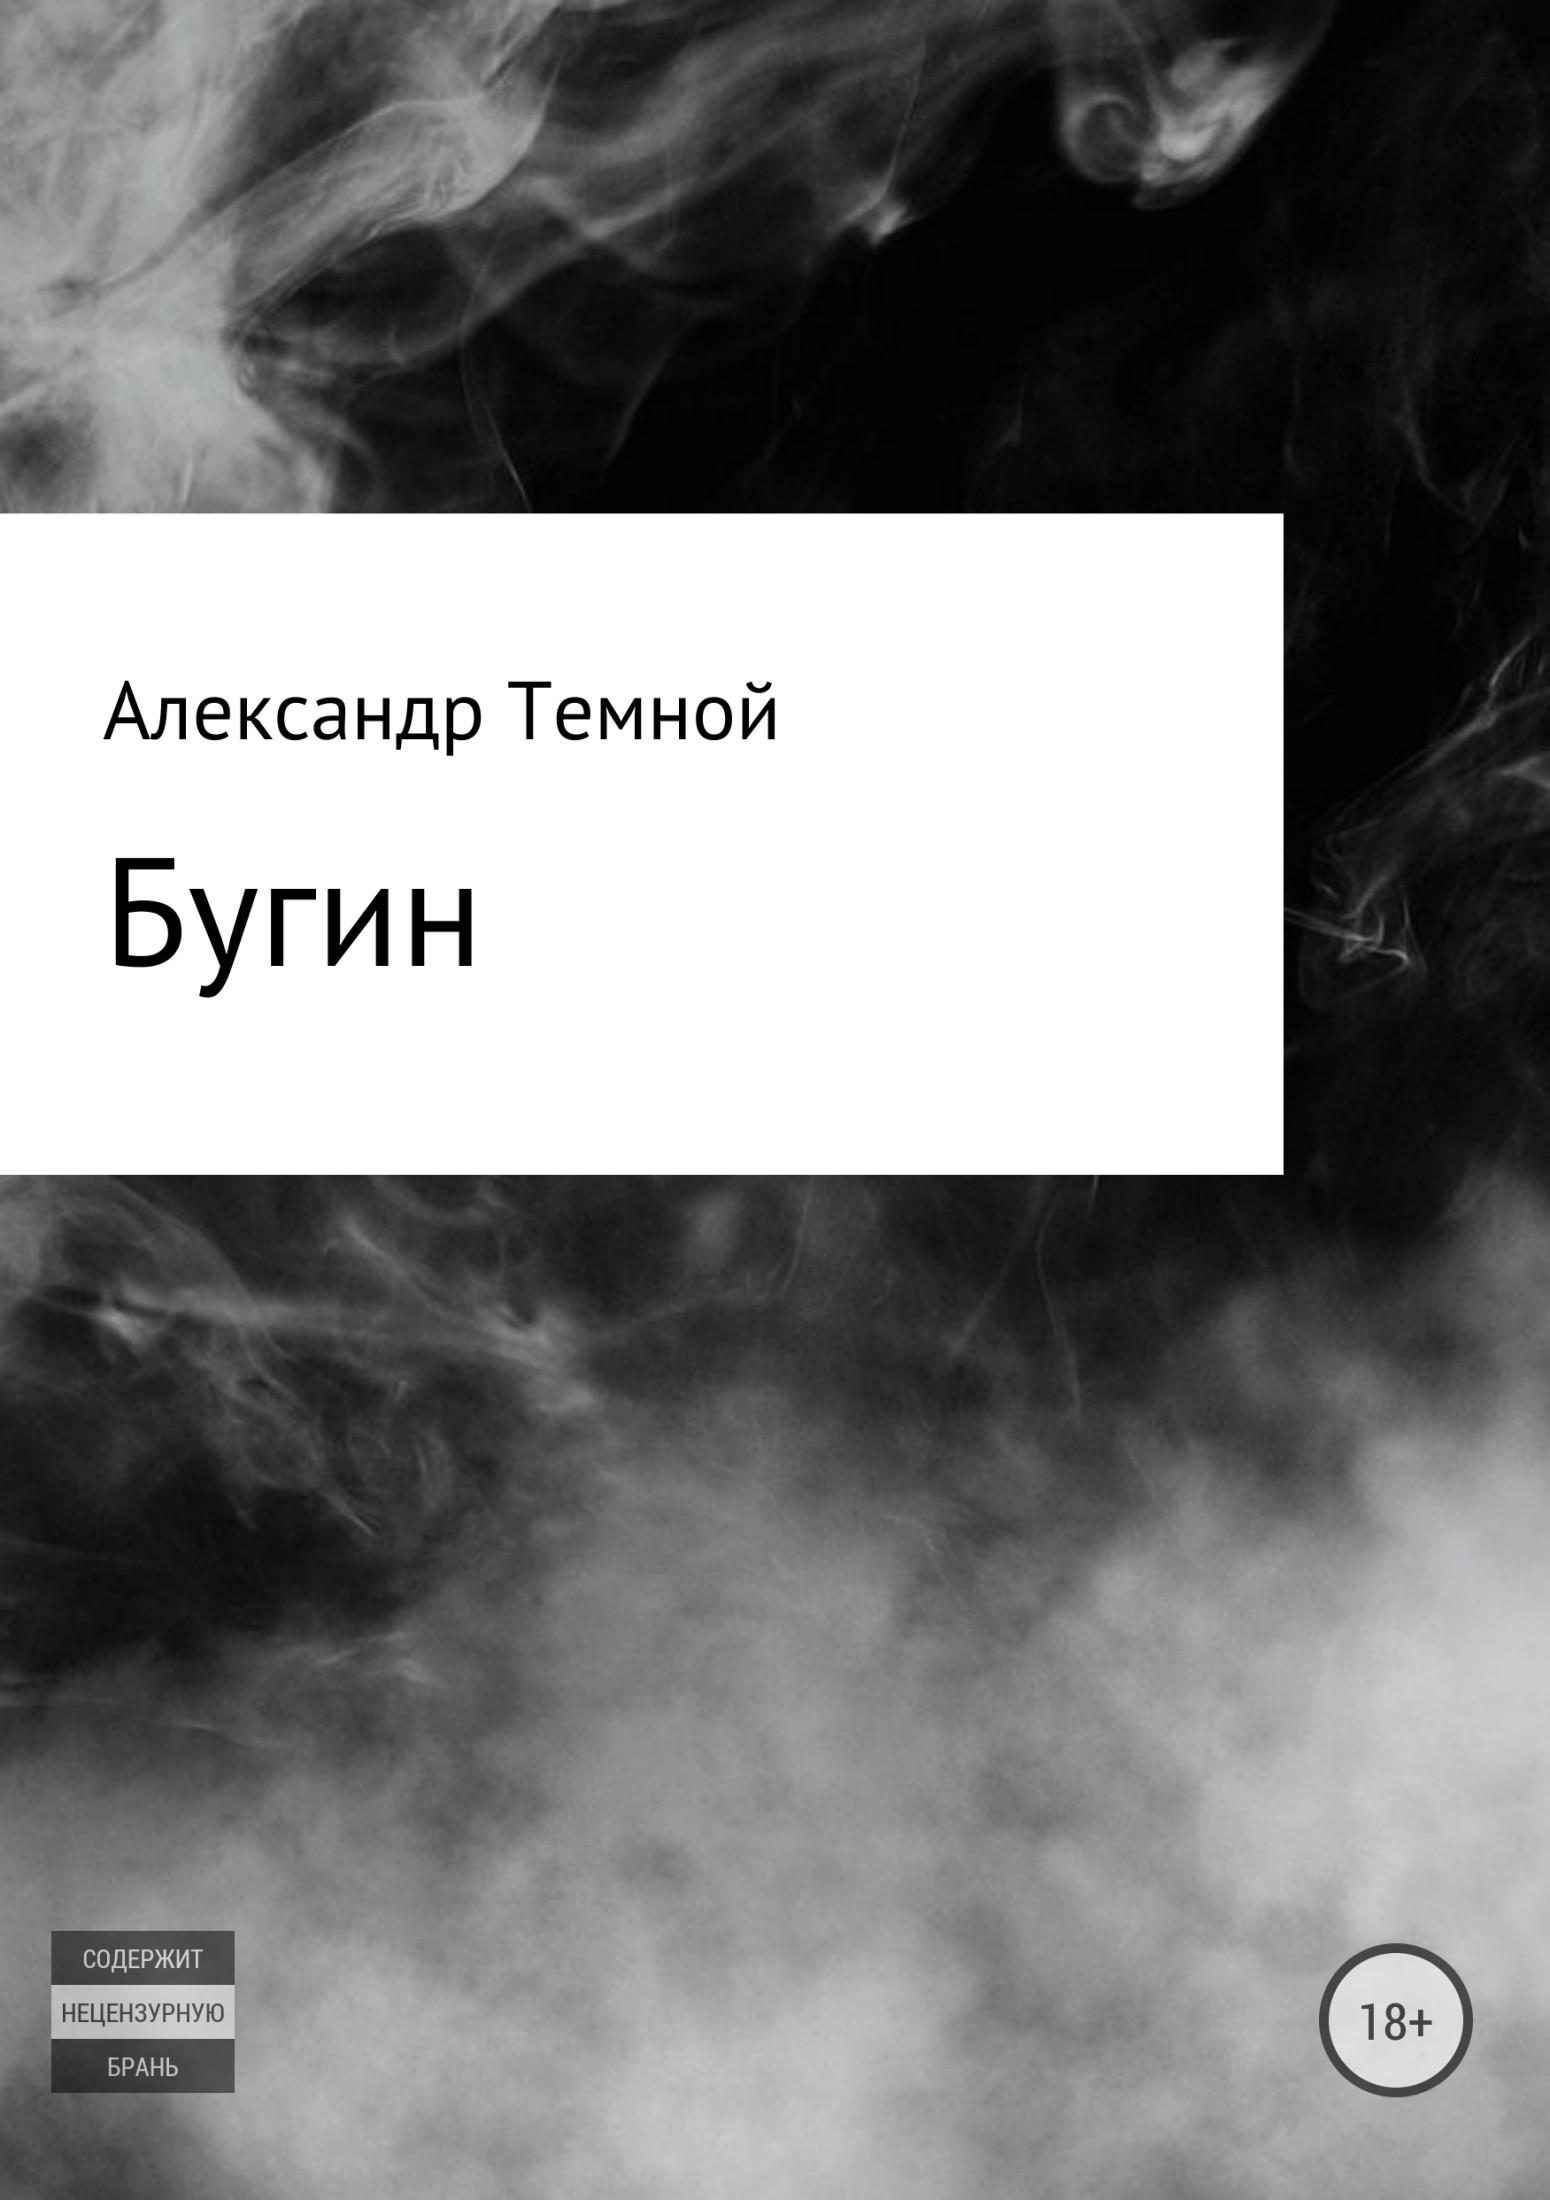 Александр Валерьевич Темной Бугин кирилл валерьевич фокин лучи уходят за горизонт